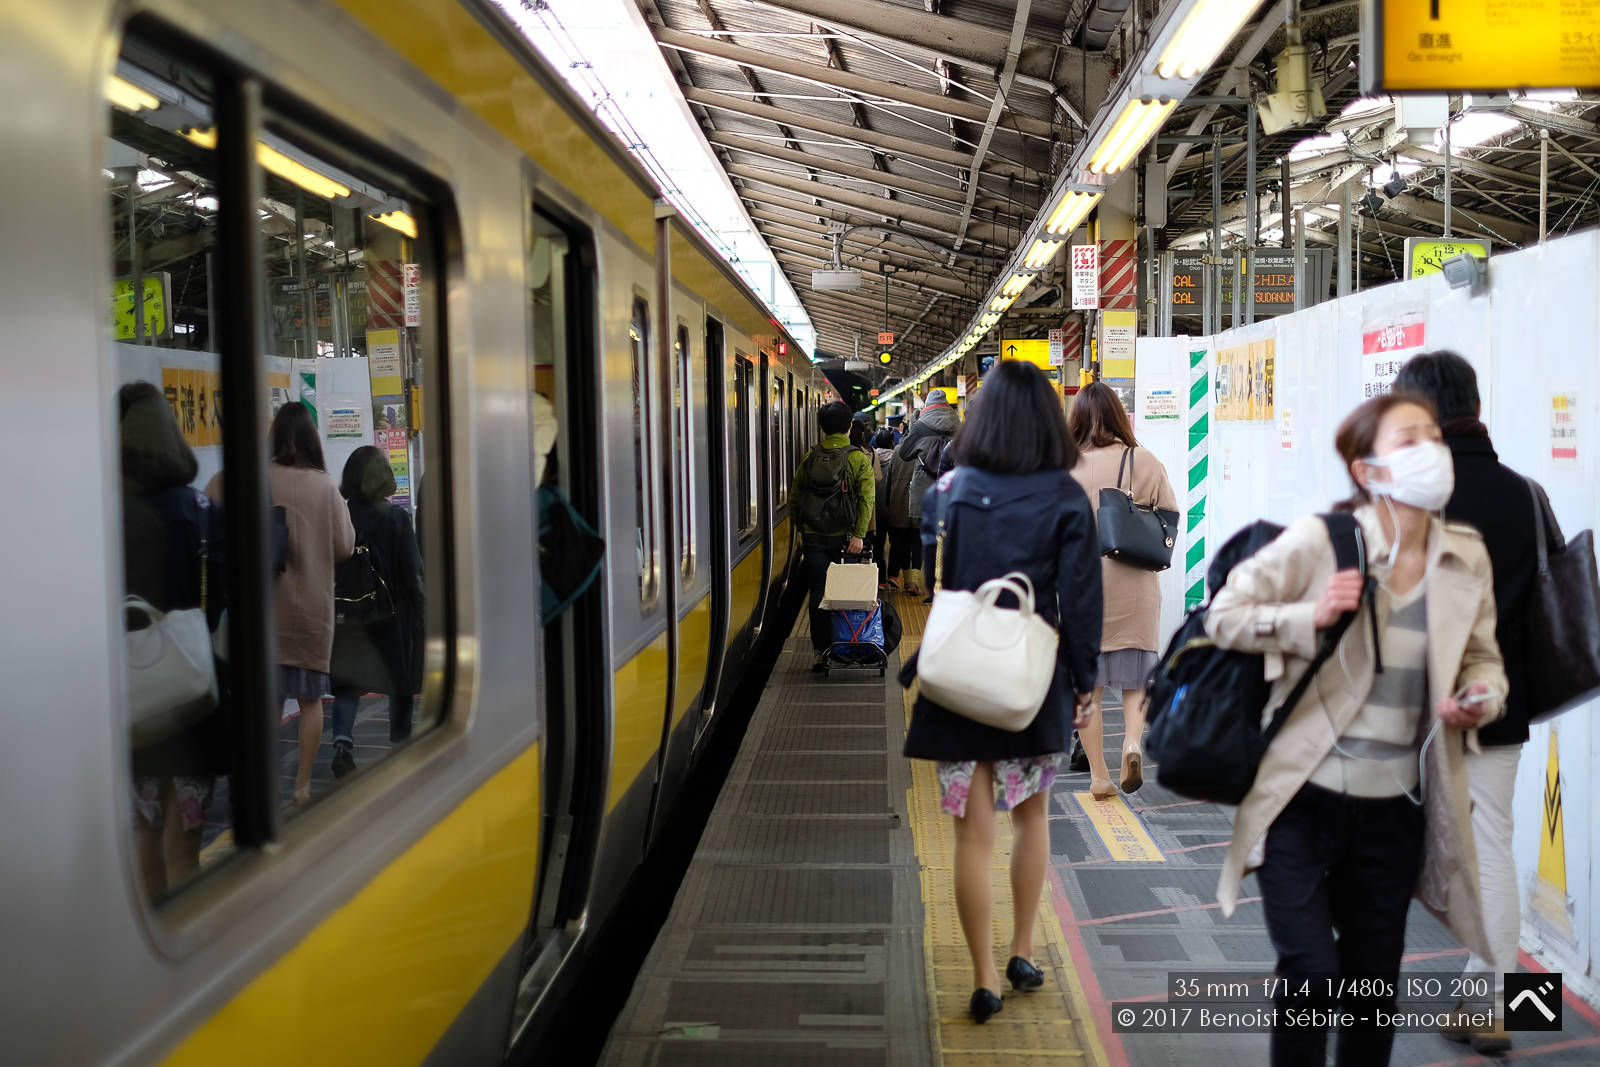 XT2 in Shinjuku